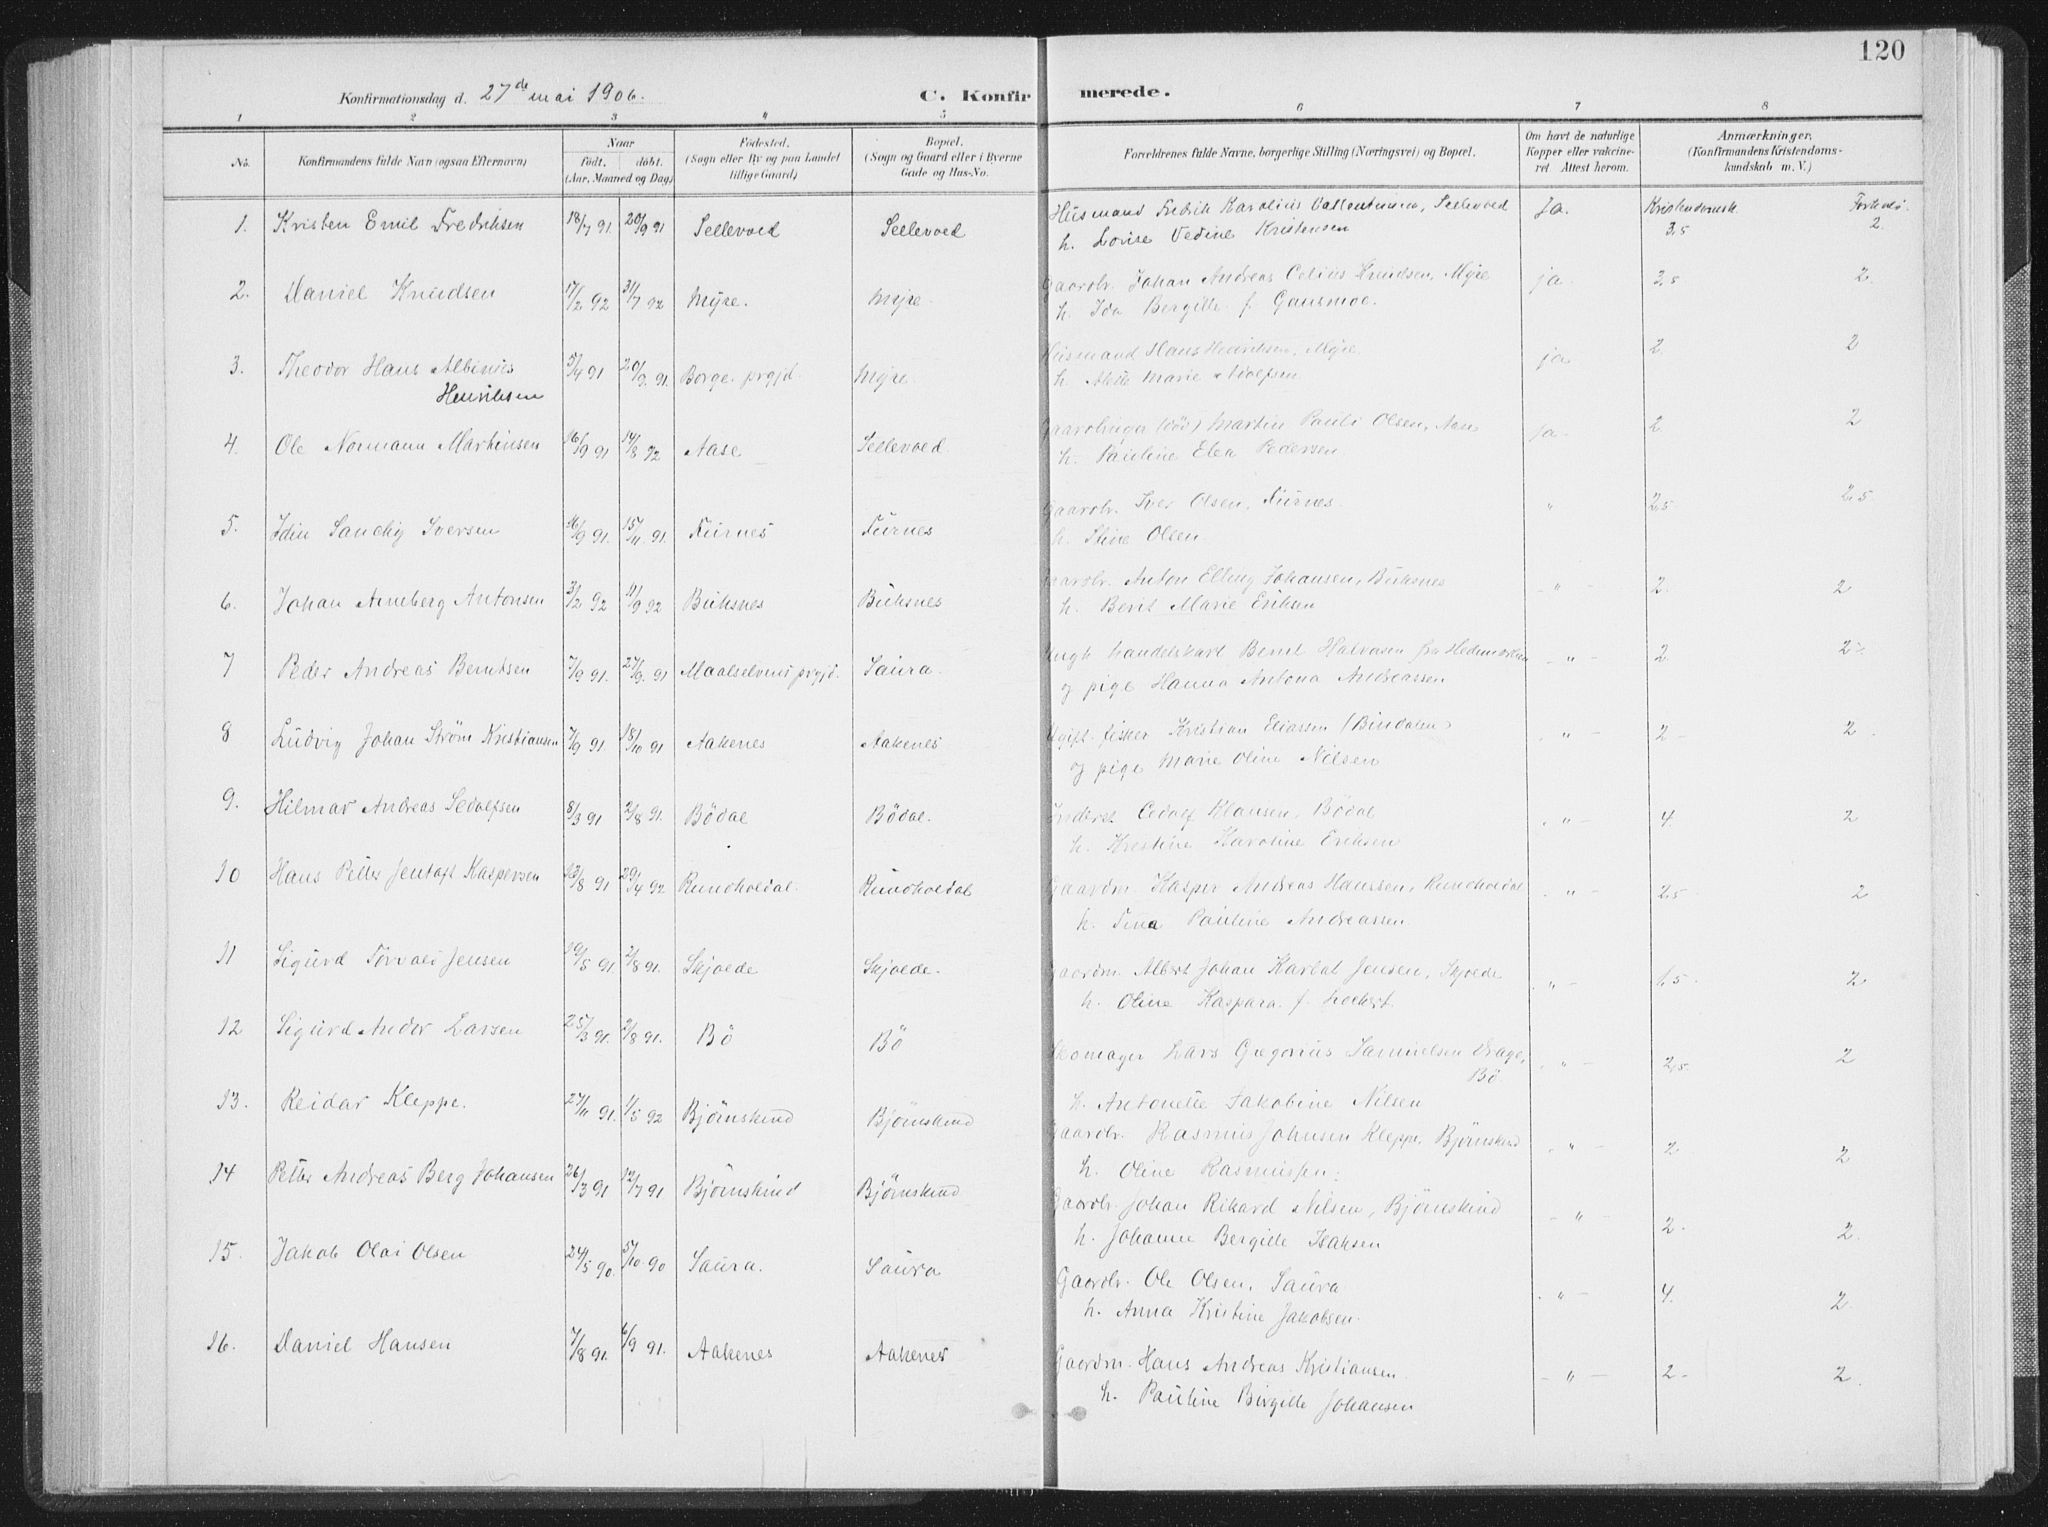 SAT, Ministerialprotokoller, klokkerbøker og fødselsregistre - Nordland, 897/L1400: Ministerialbok nr. 897A07, 1897-1908, s. 120